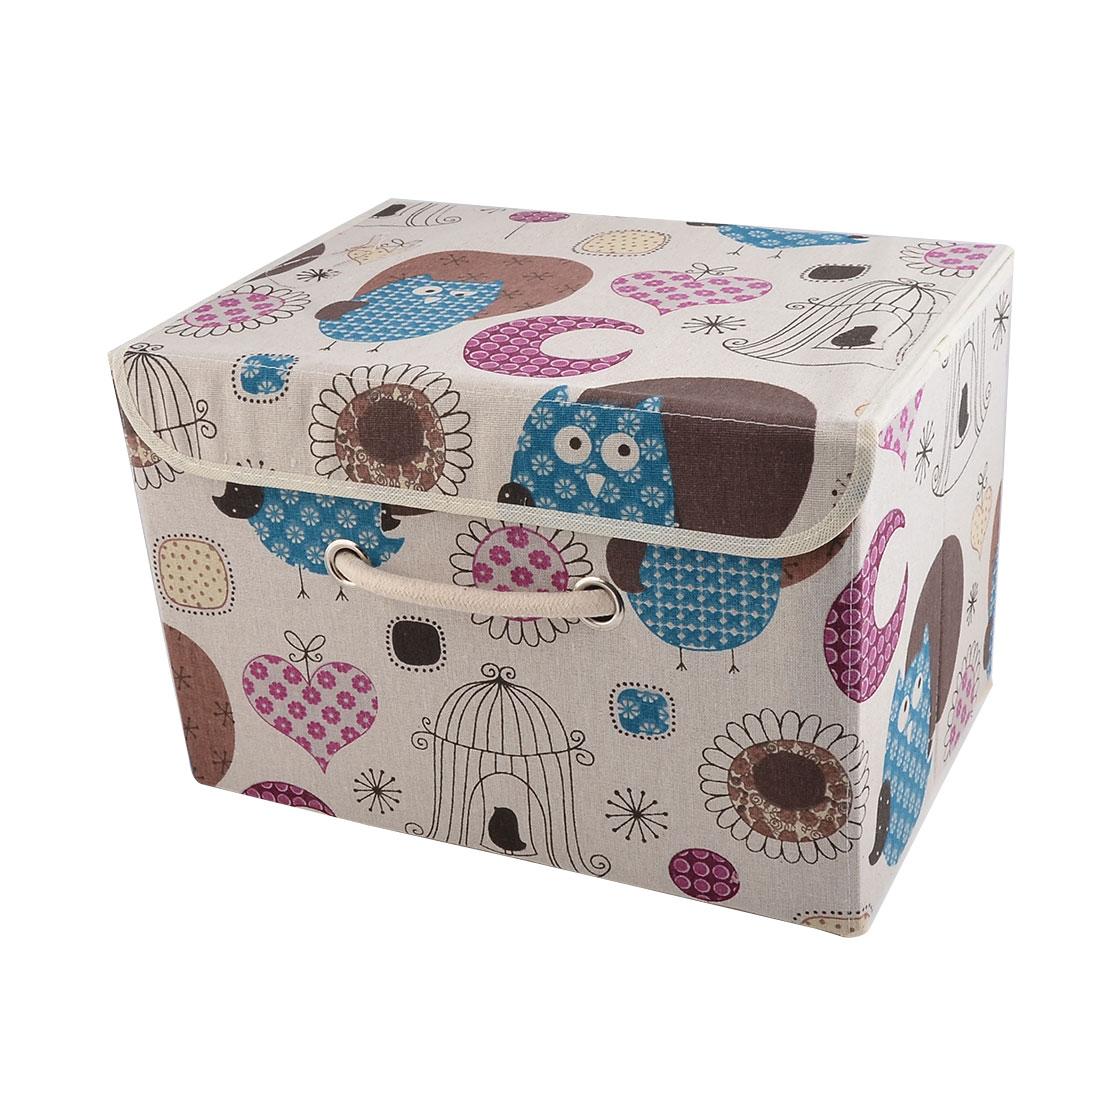 Home Cotton Linen Owl Pattern Clothes Books Snacks Holder Storage Box Organizer